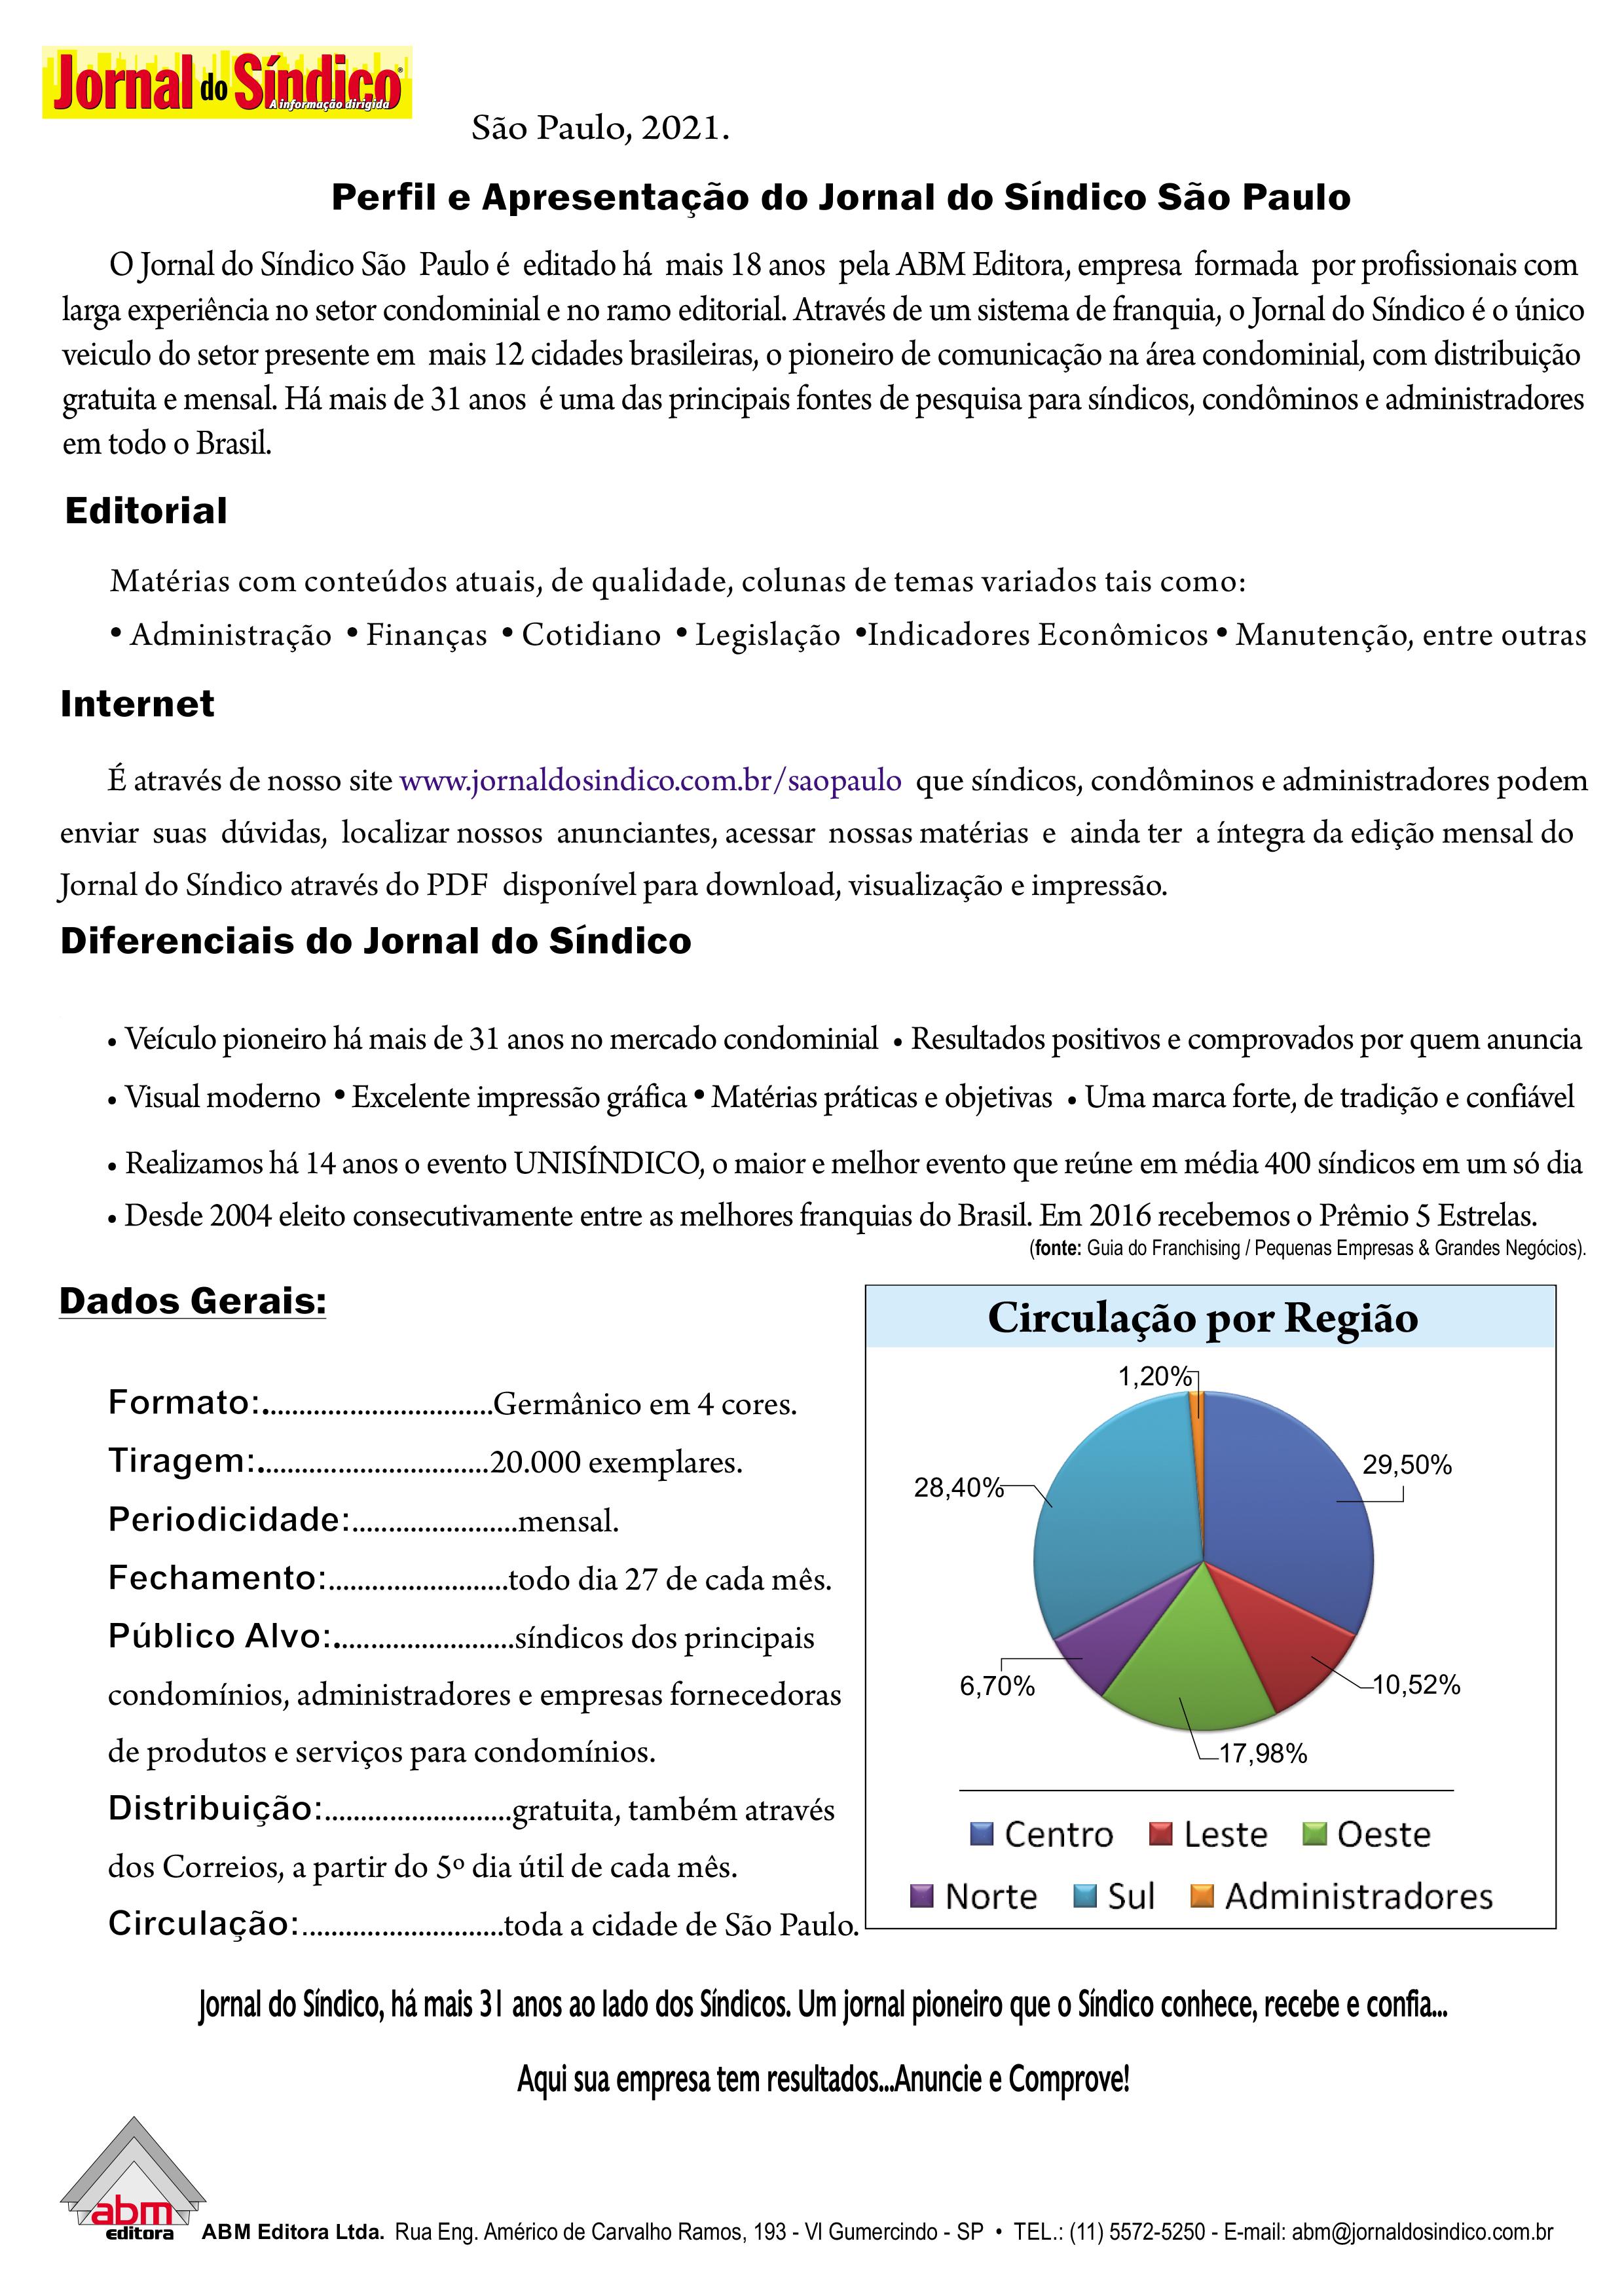 Perfil_2021.cdr